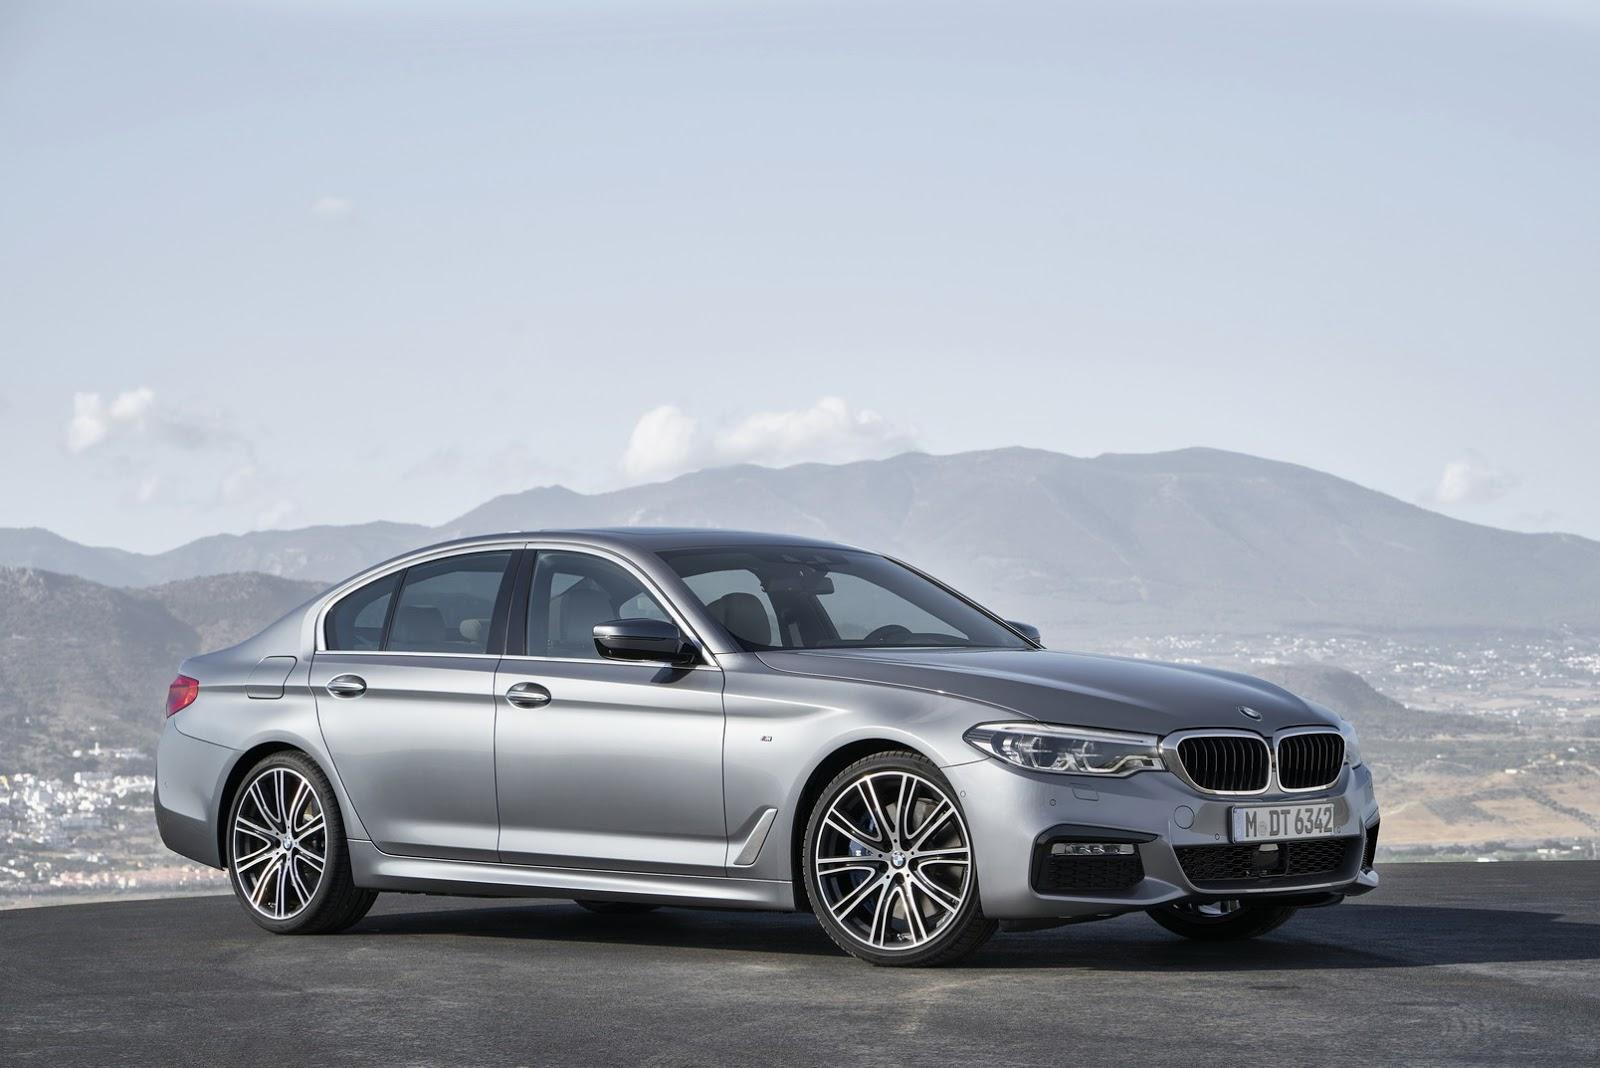 2017-BMW-5-Series-17.jpg